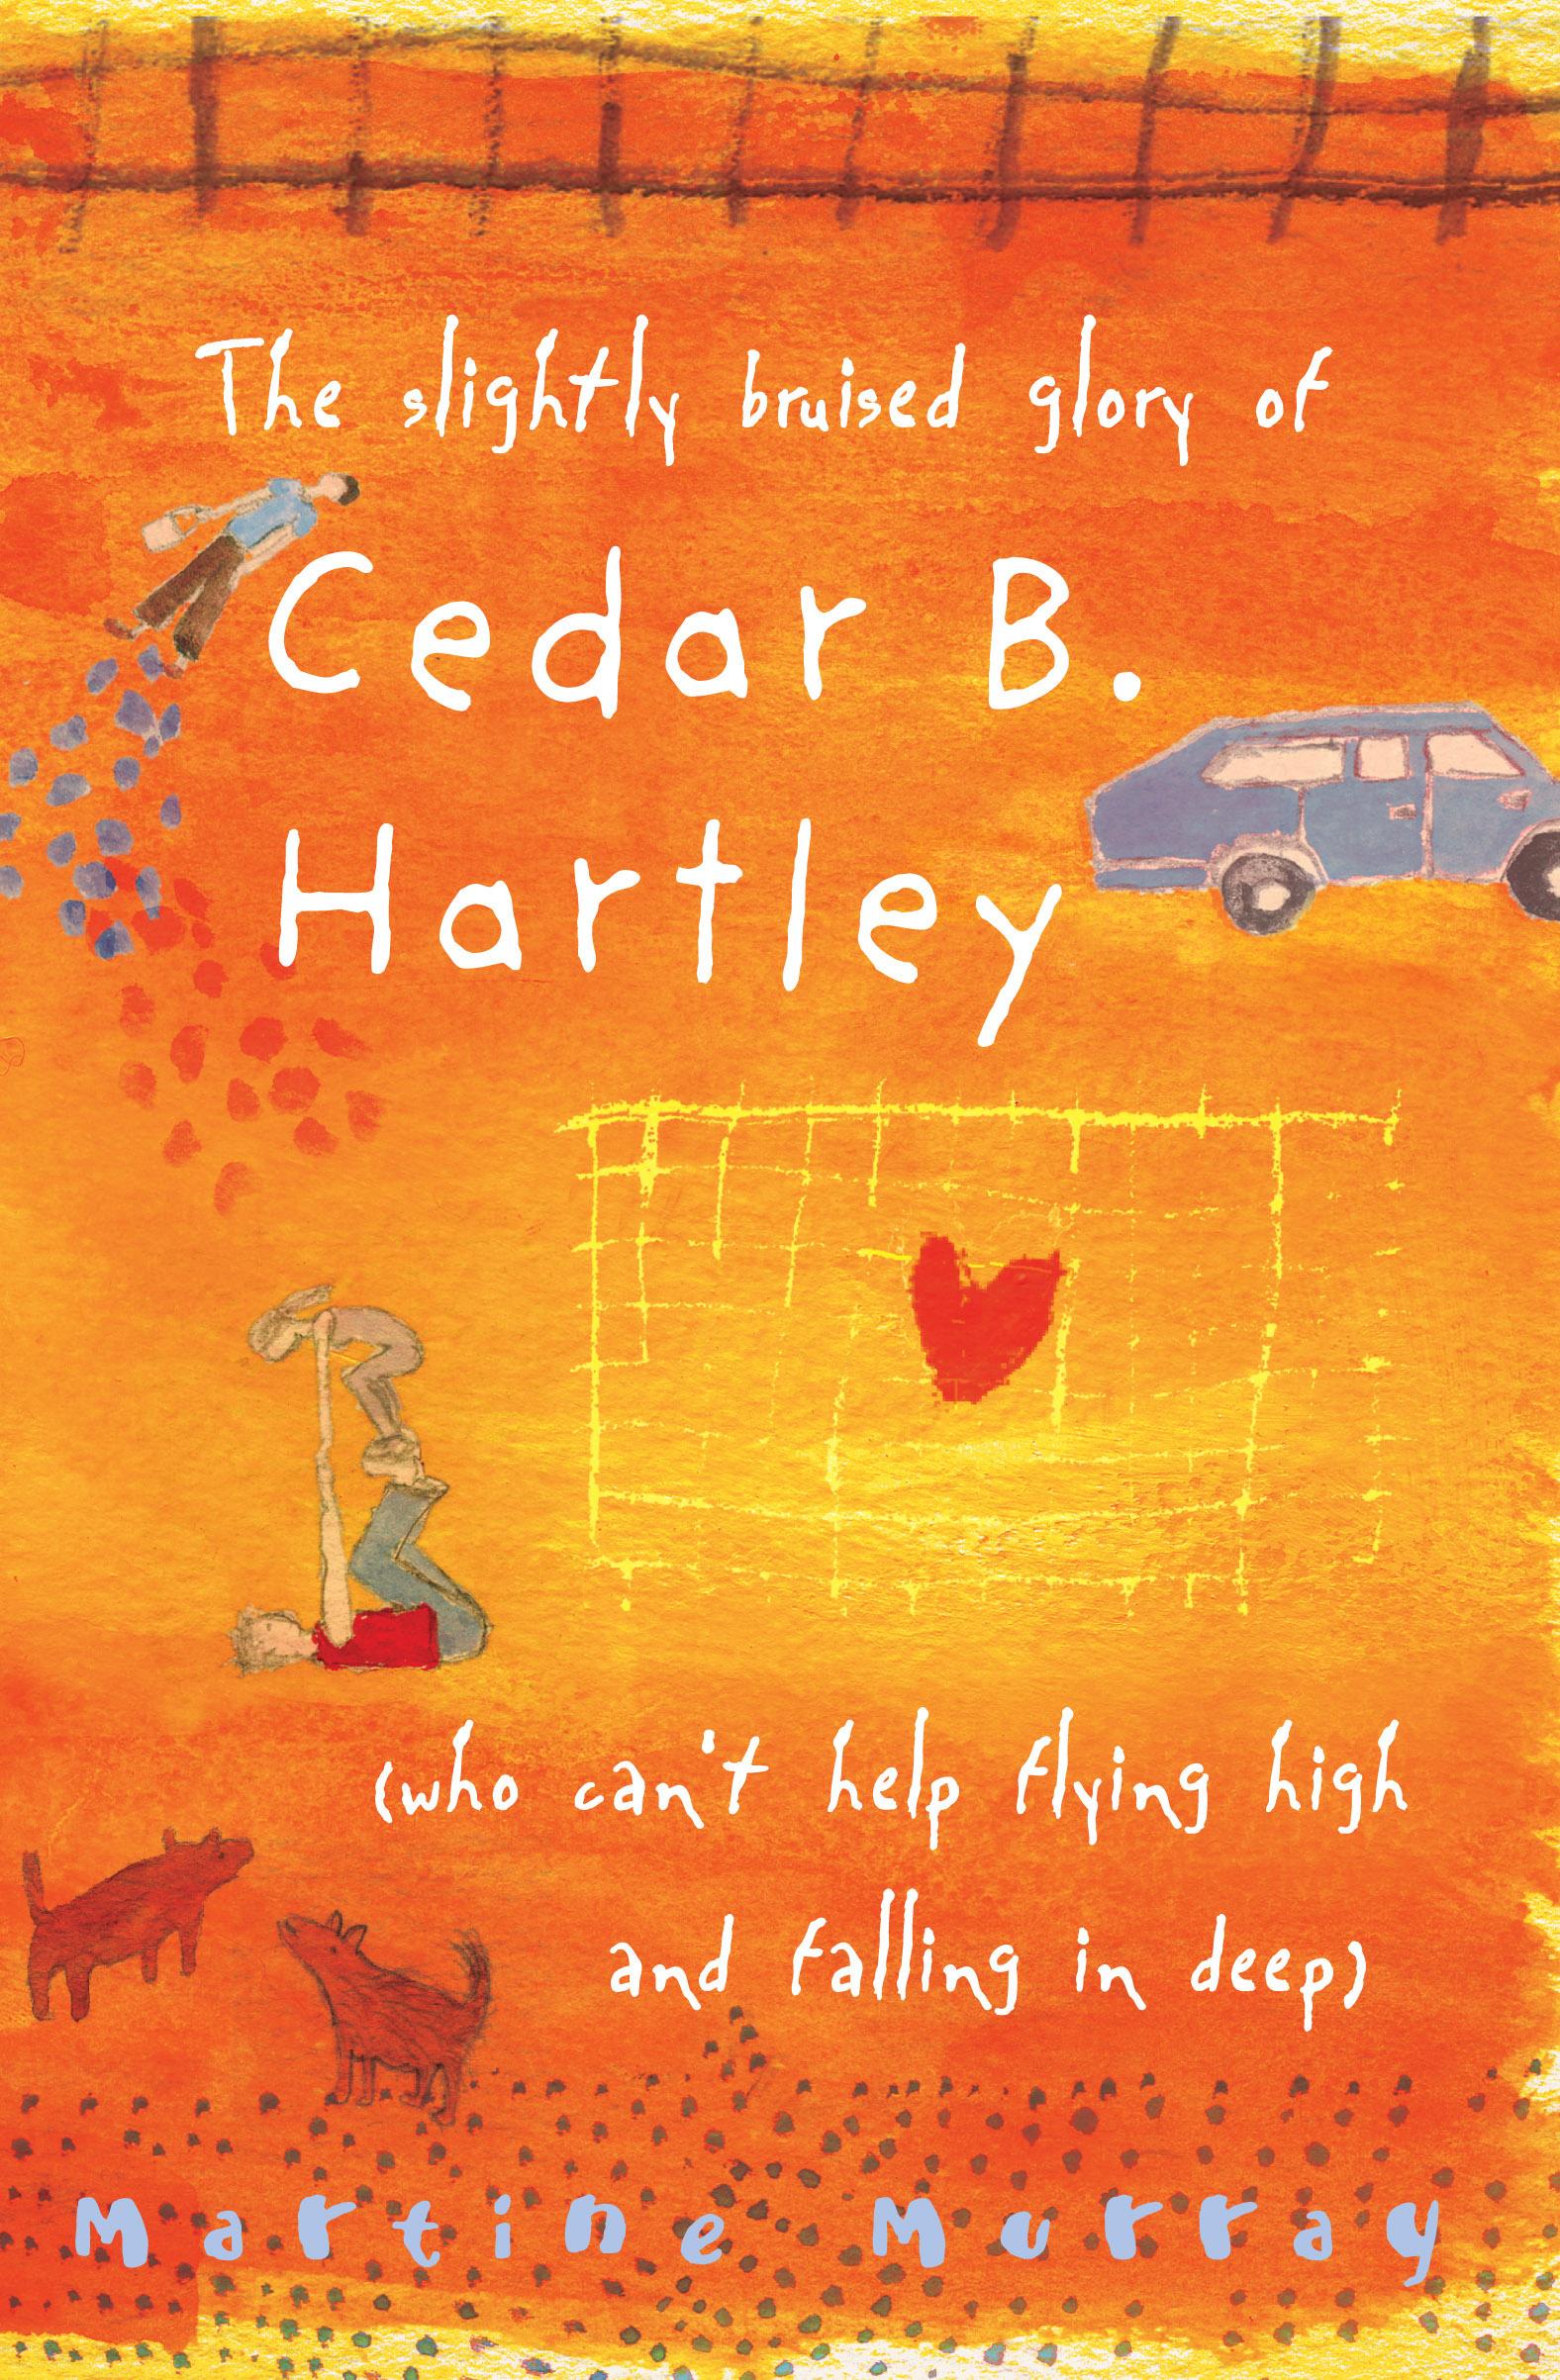 The slightly bruised glory of Cedar B Hartley